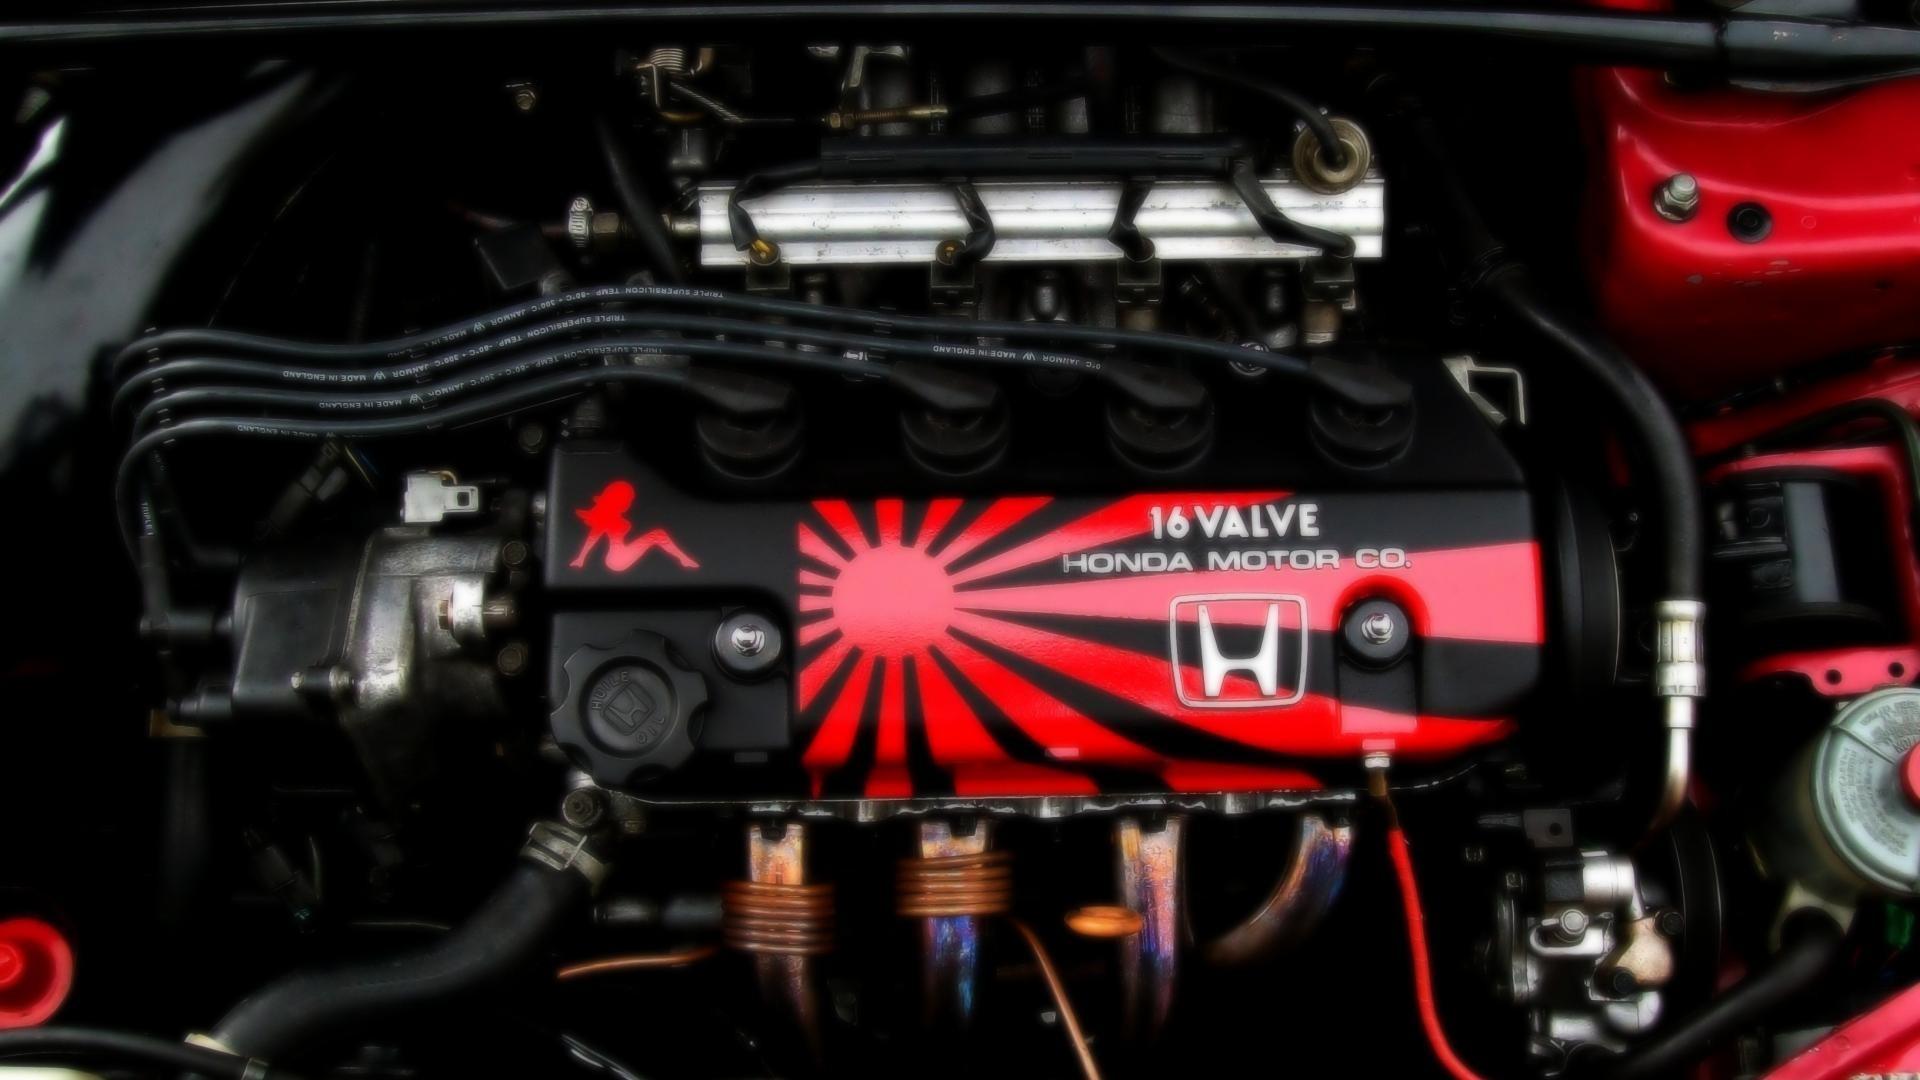 Honda Civic Imid Wallpaper 54 images